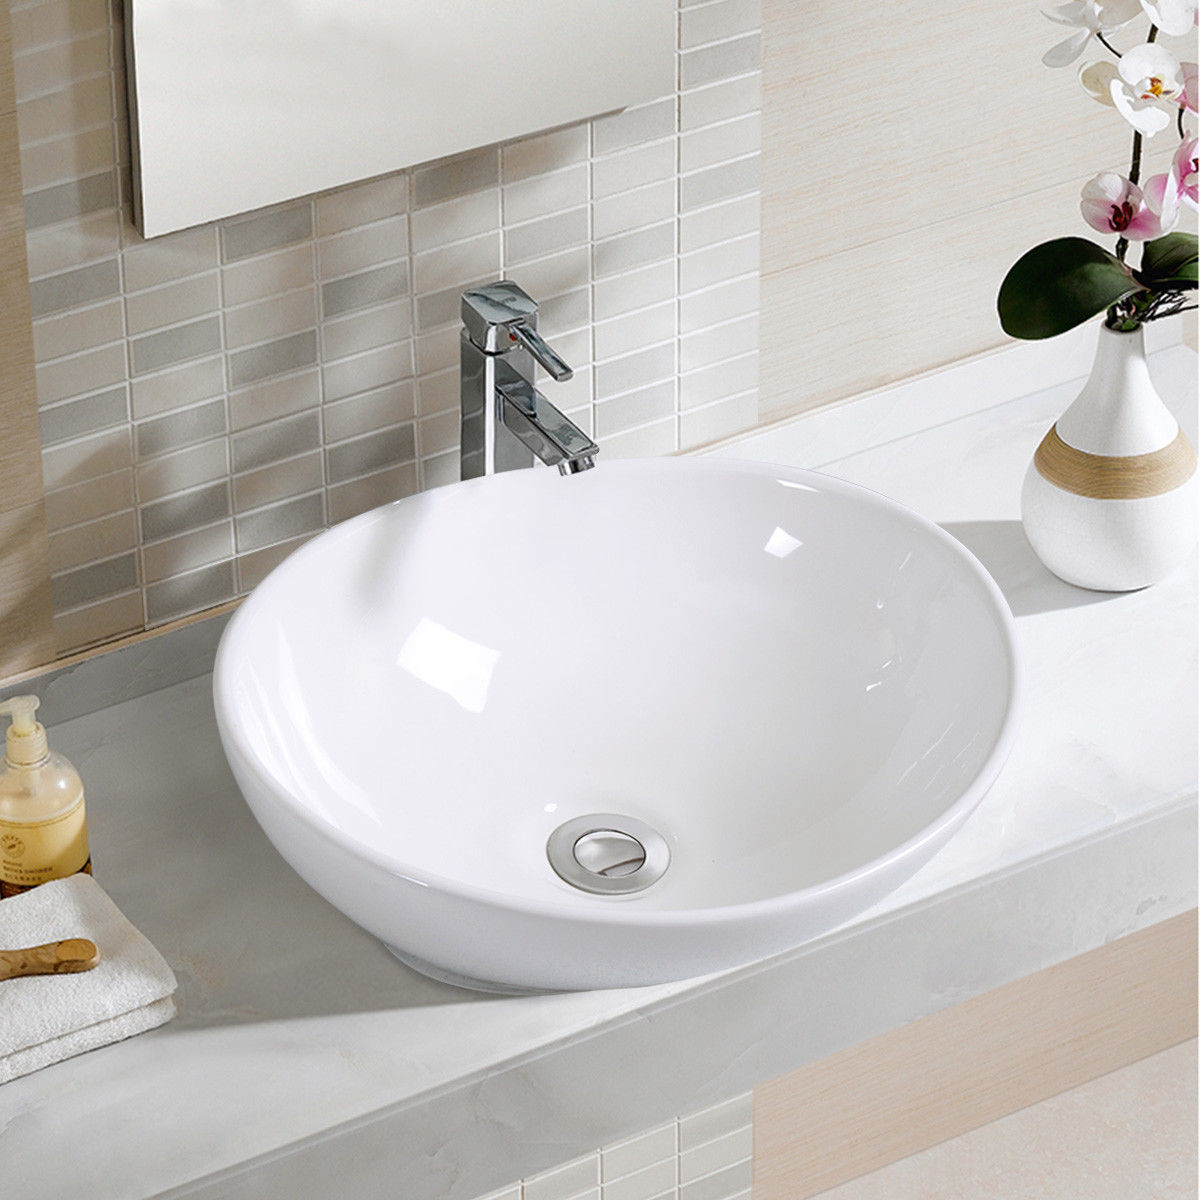 Beau Costway Oval Bathroom Basin Ceramic Vessel Sink Bowl Vanity Porcelain W/  Pop Up Drain   Walmart.com